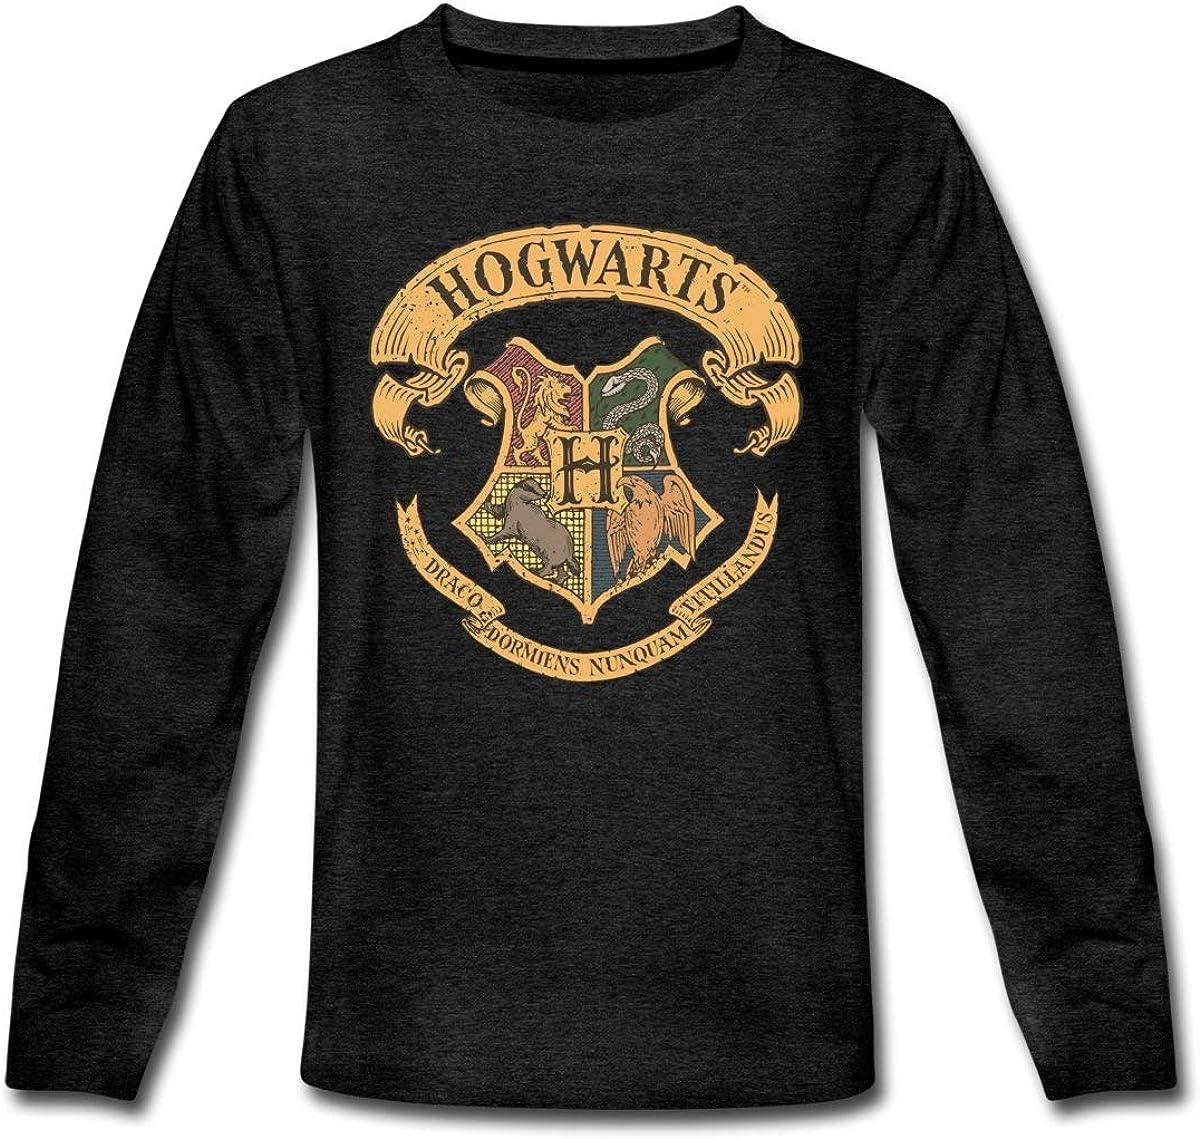 Spreadshirt Harry Potter Hogwarts Coat of Arms Teenagers Longsleeve Shirt